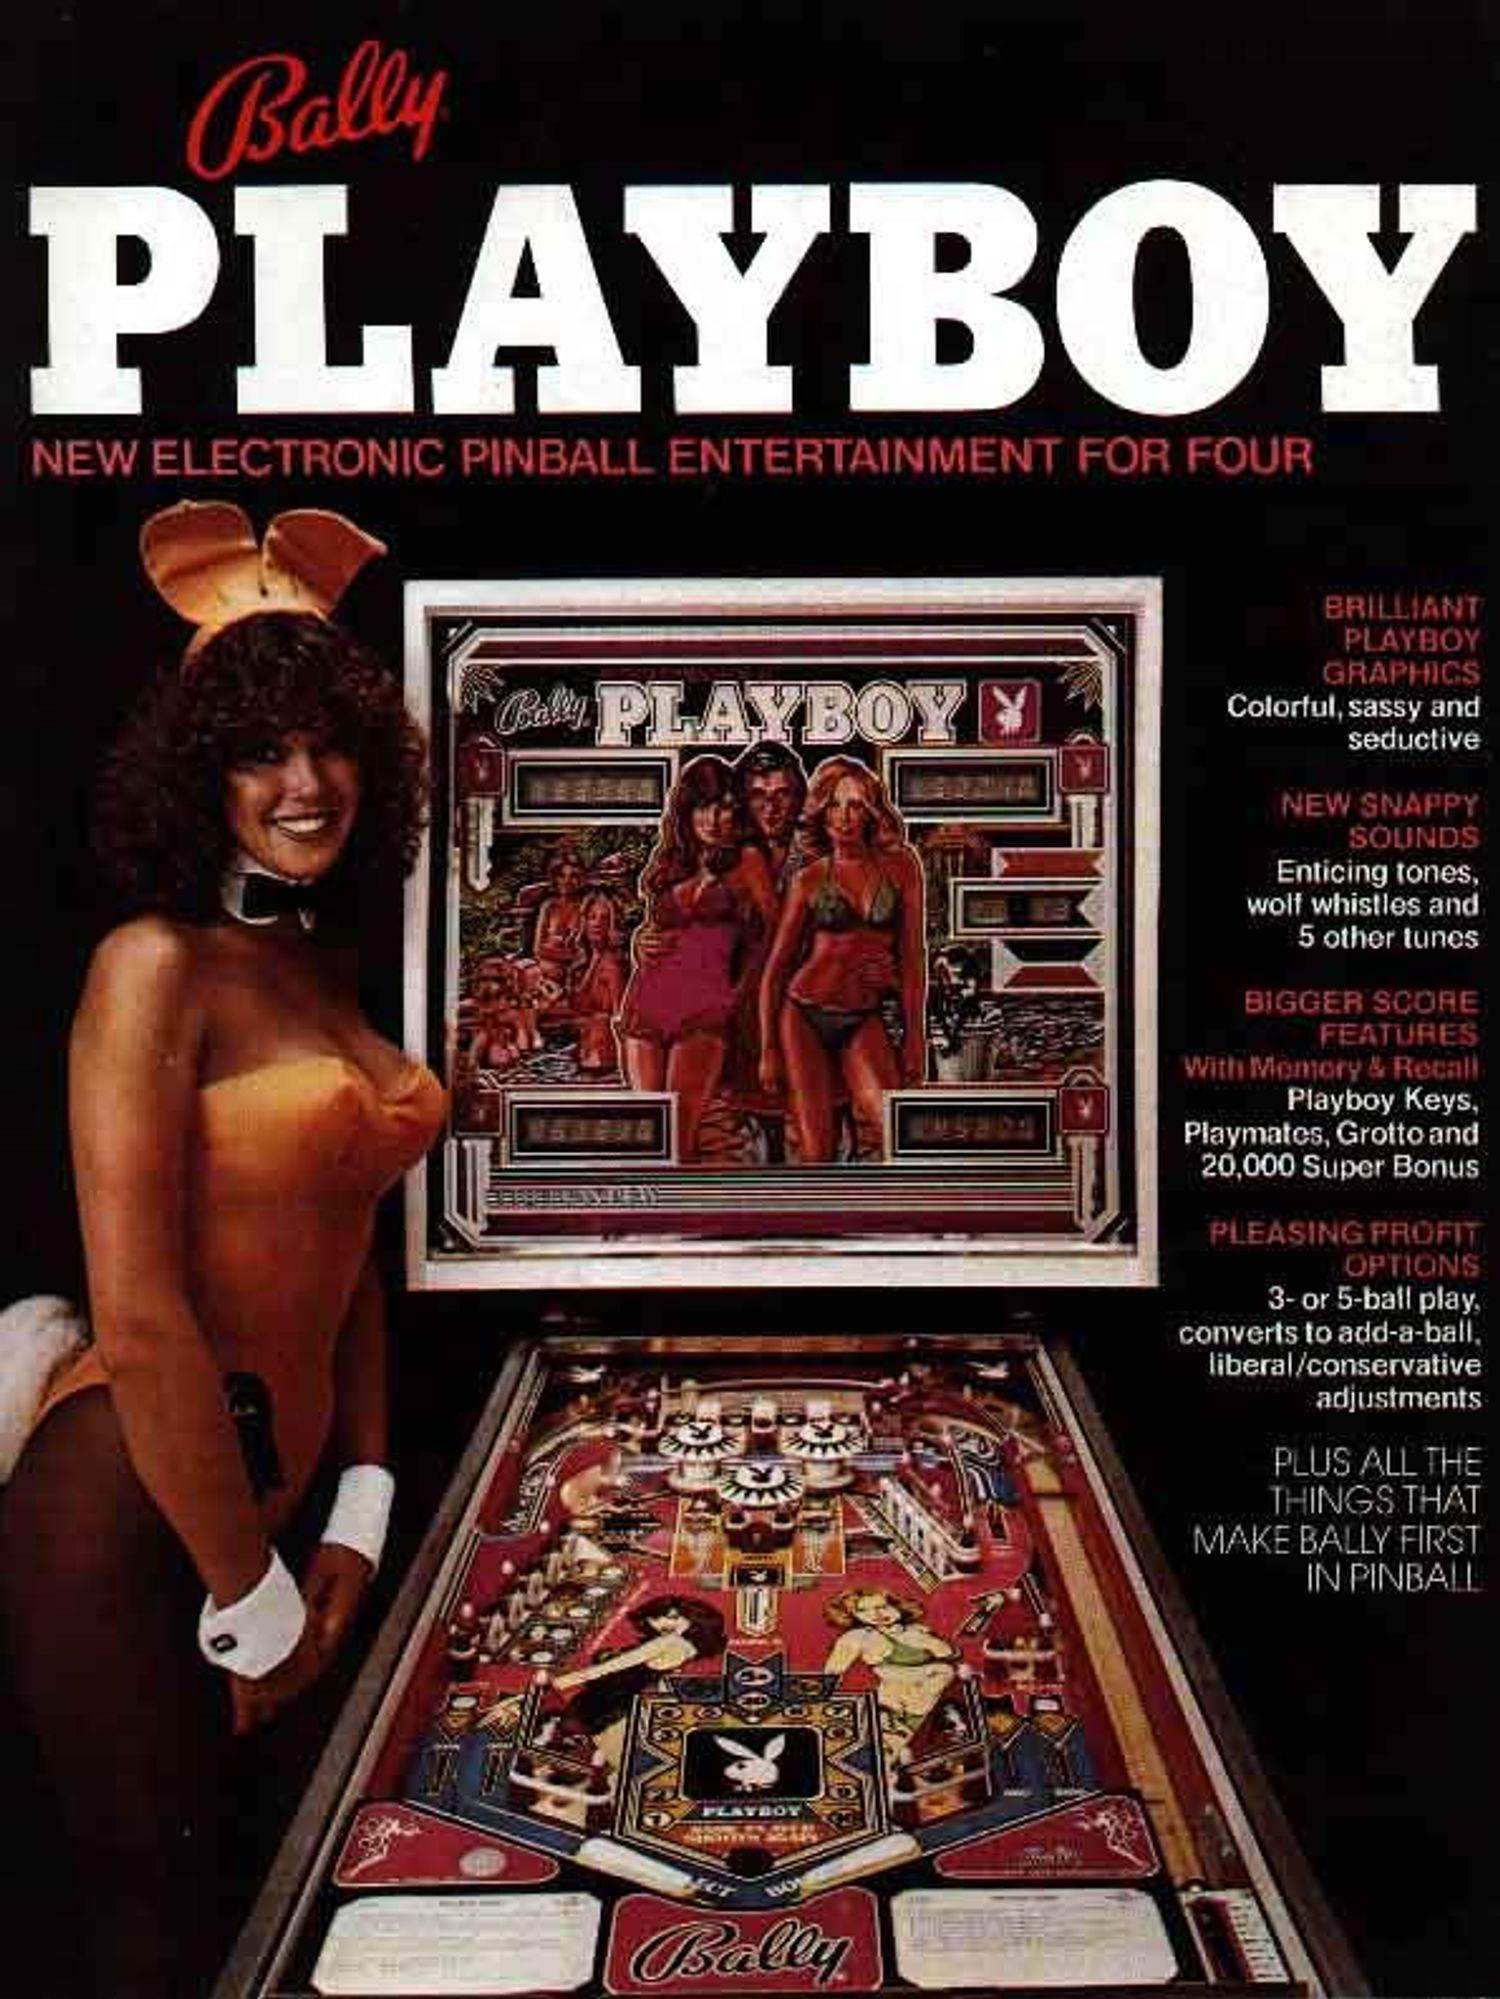 Playboy Flyer front